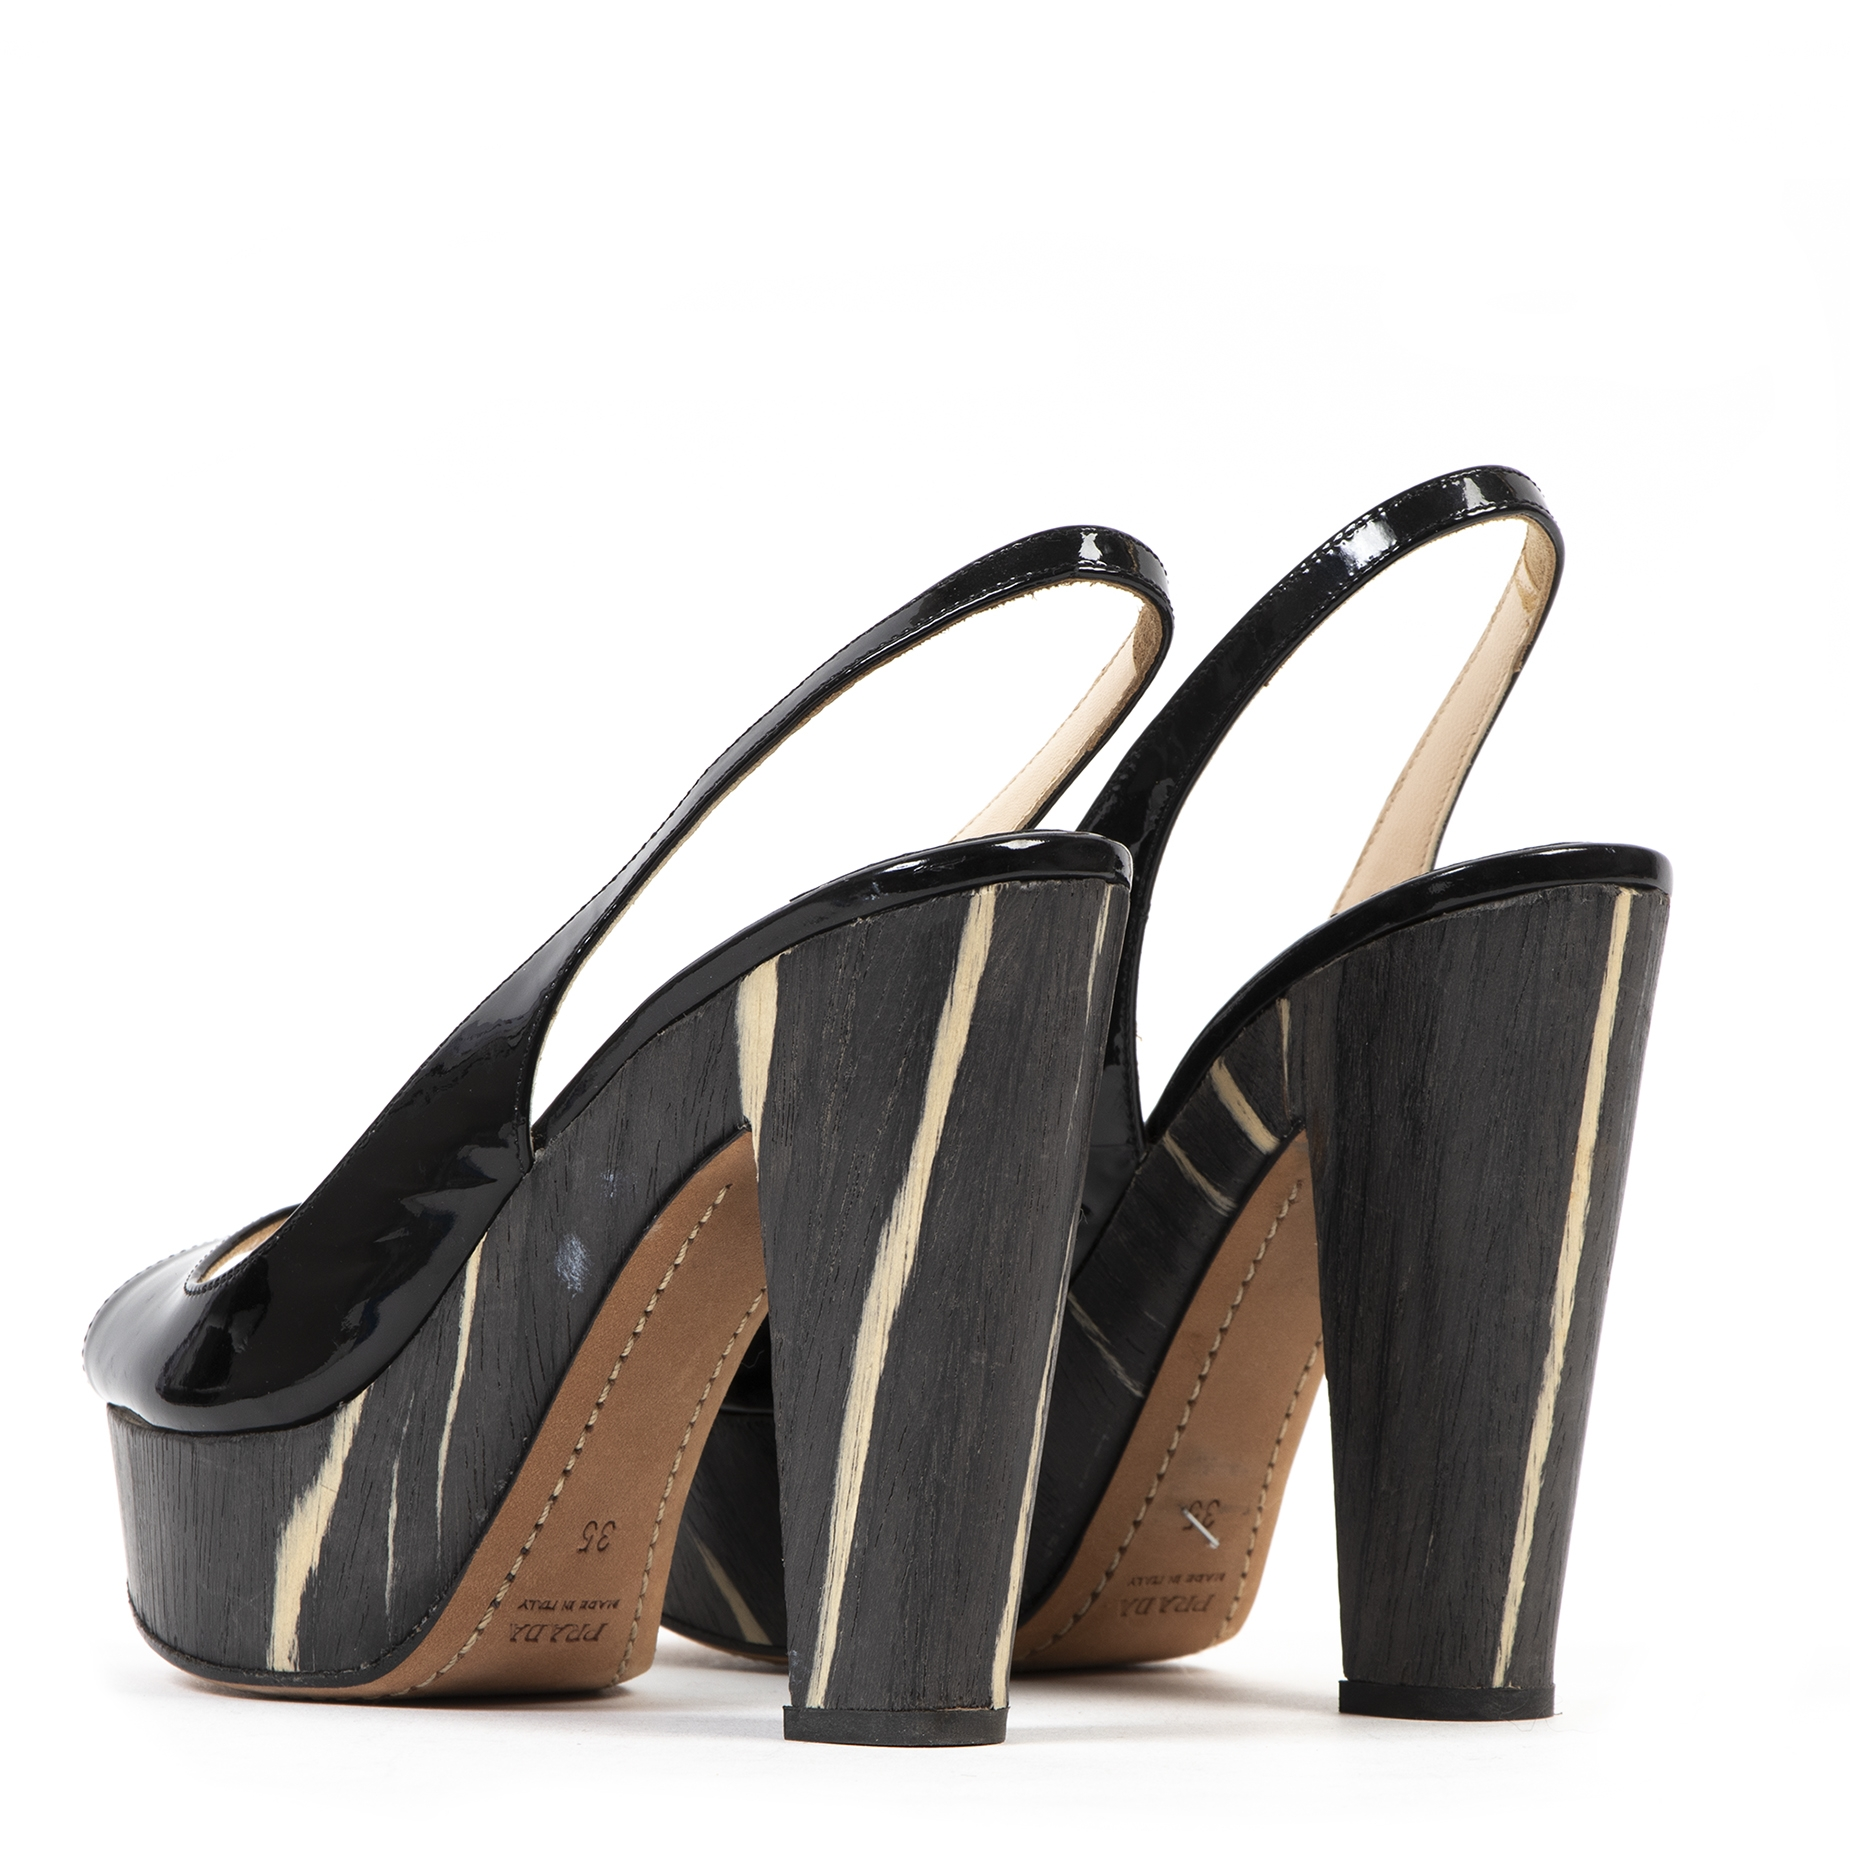 Authentic second-hand vintage Prada Patent Leather Wood Heel Slingback Platforms buy online webshop LabelLOV